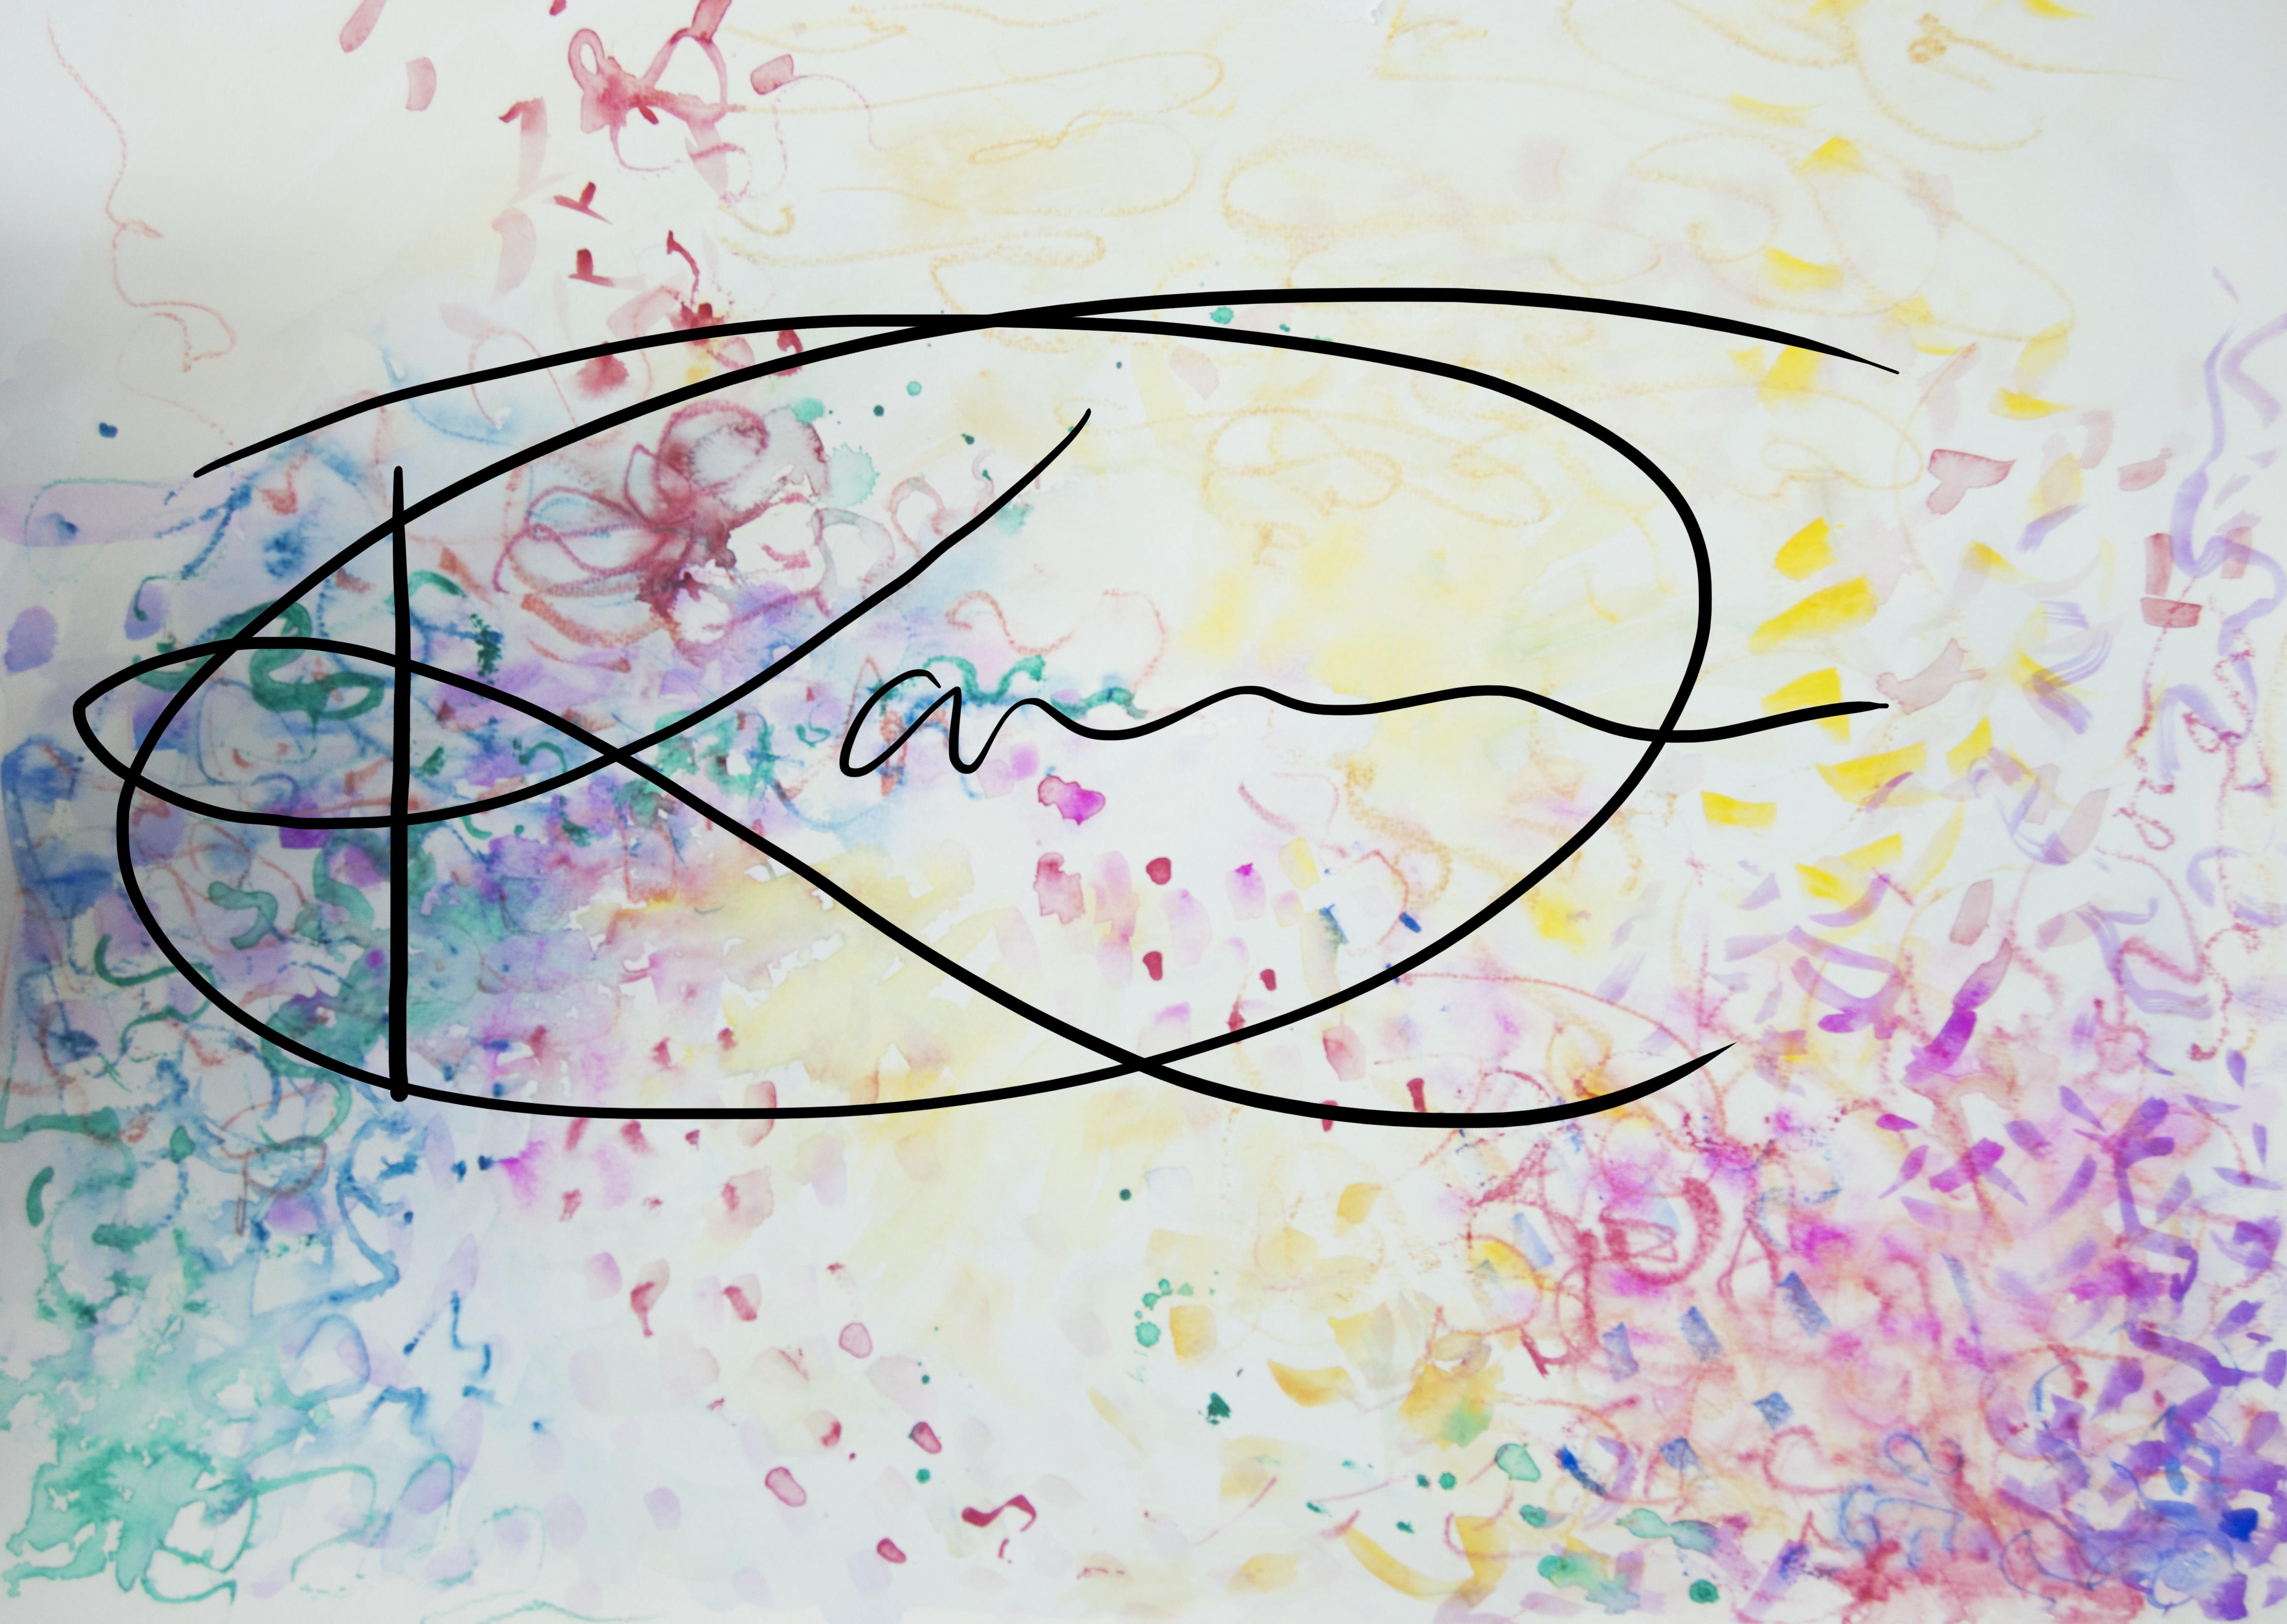 Karina Thome's Signature